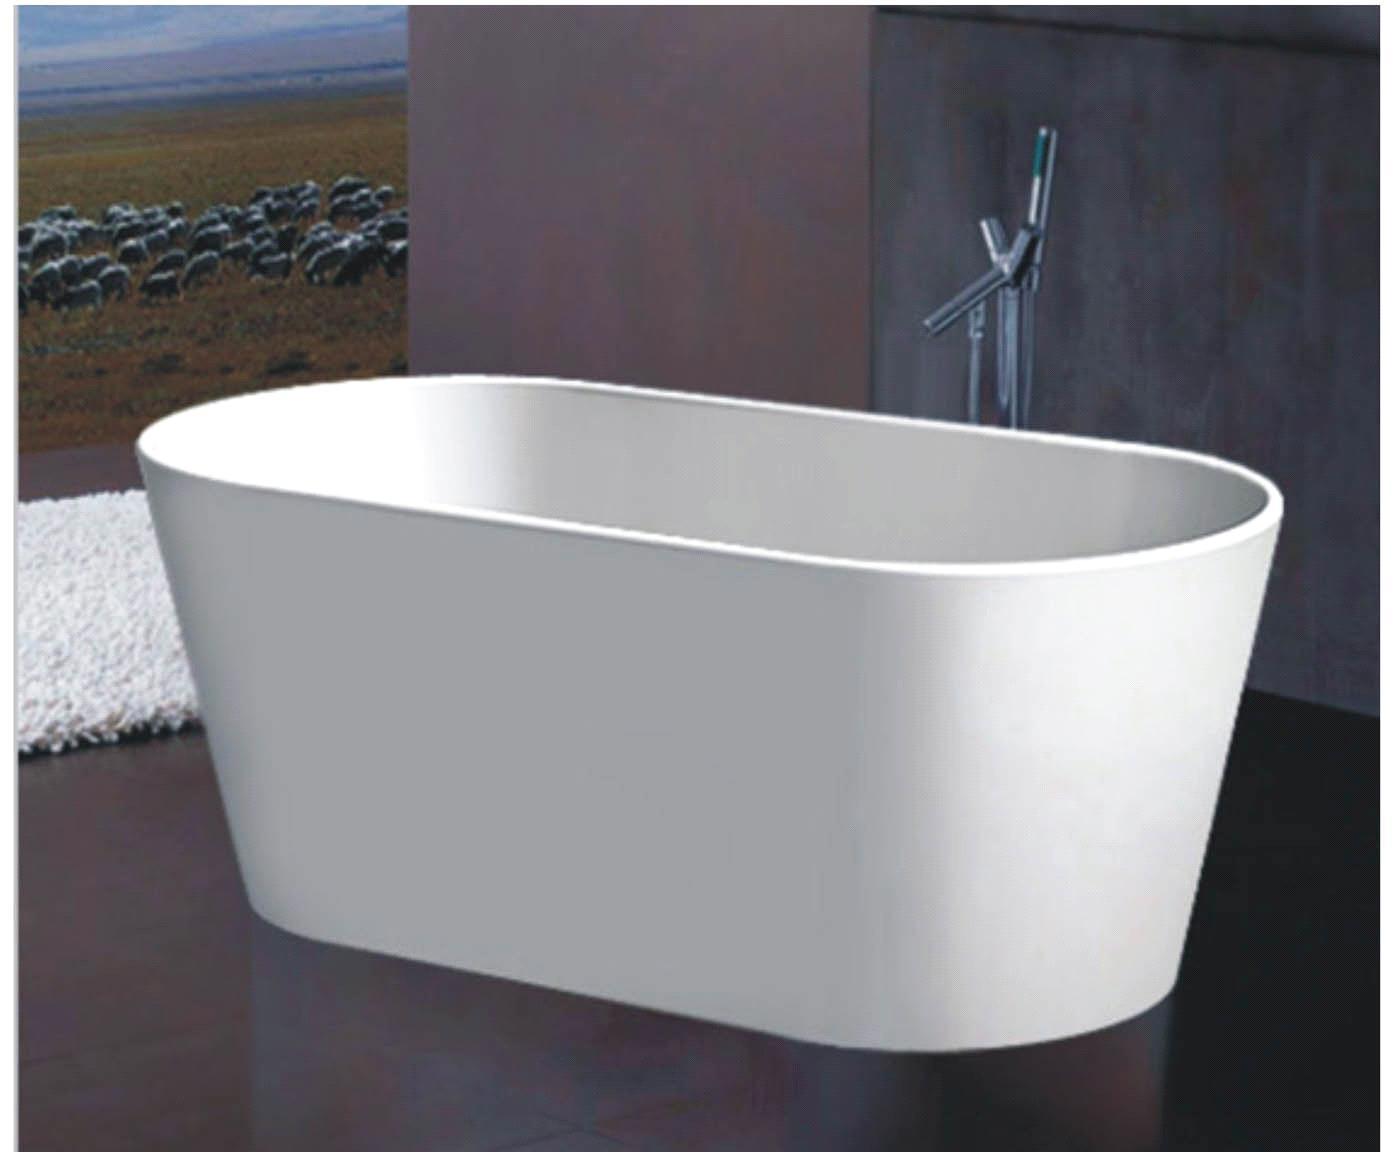 bathtub lv 8606 china stone bathtub love. Black Bedroom Furniture Sets. Home Design Ideas